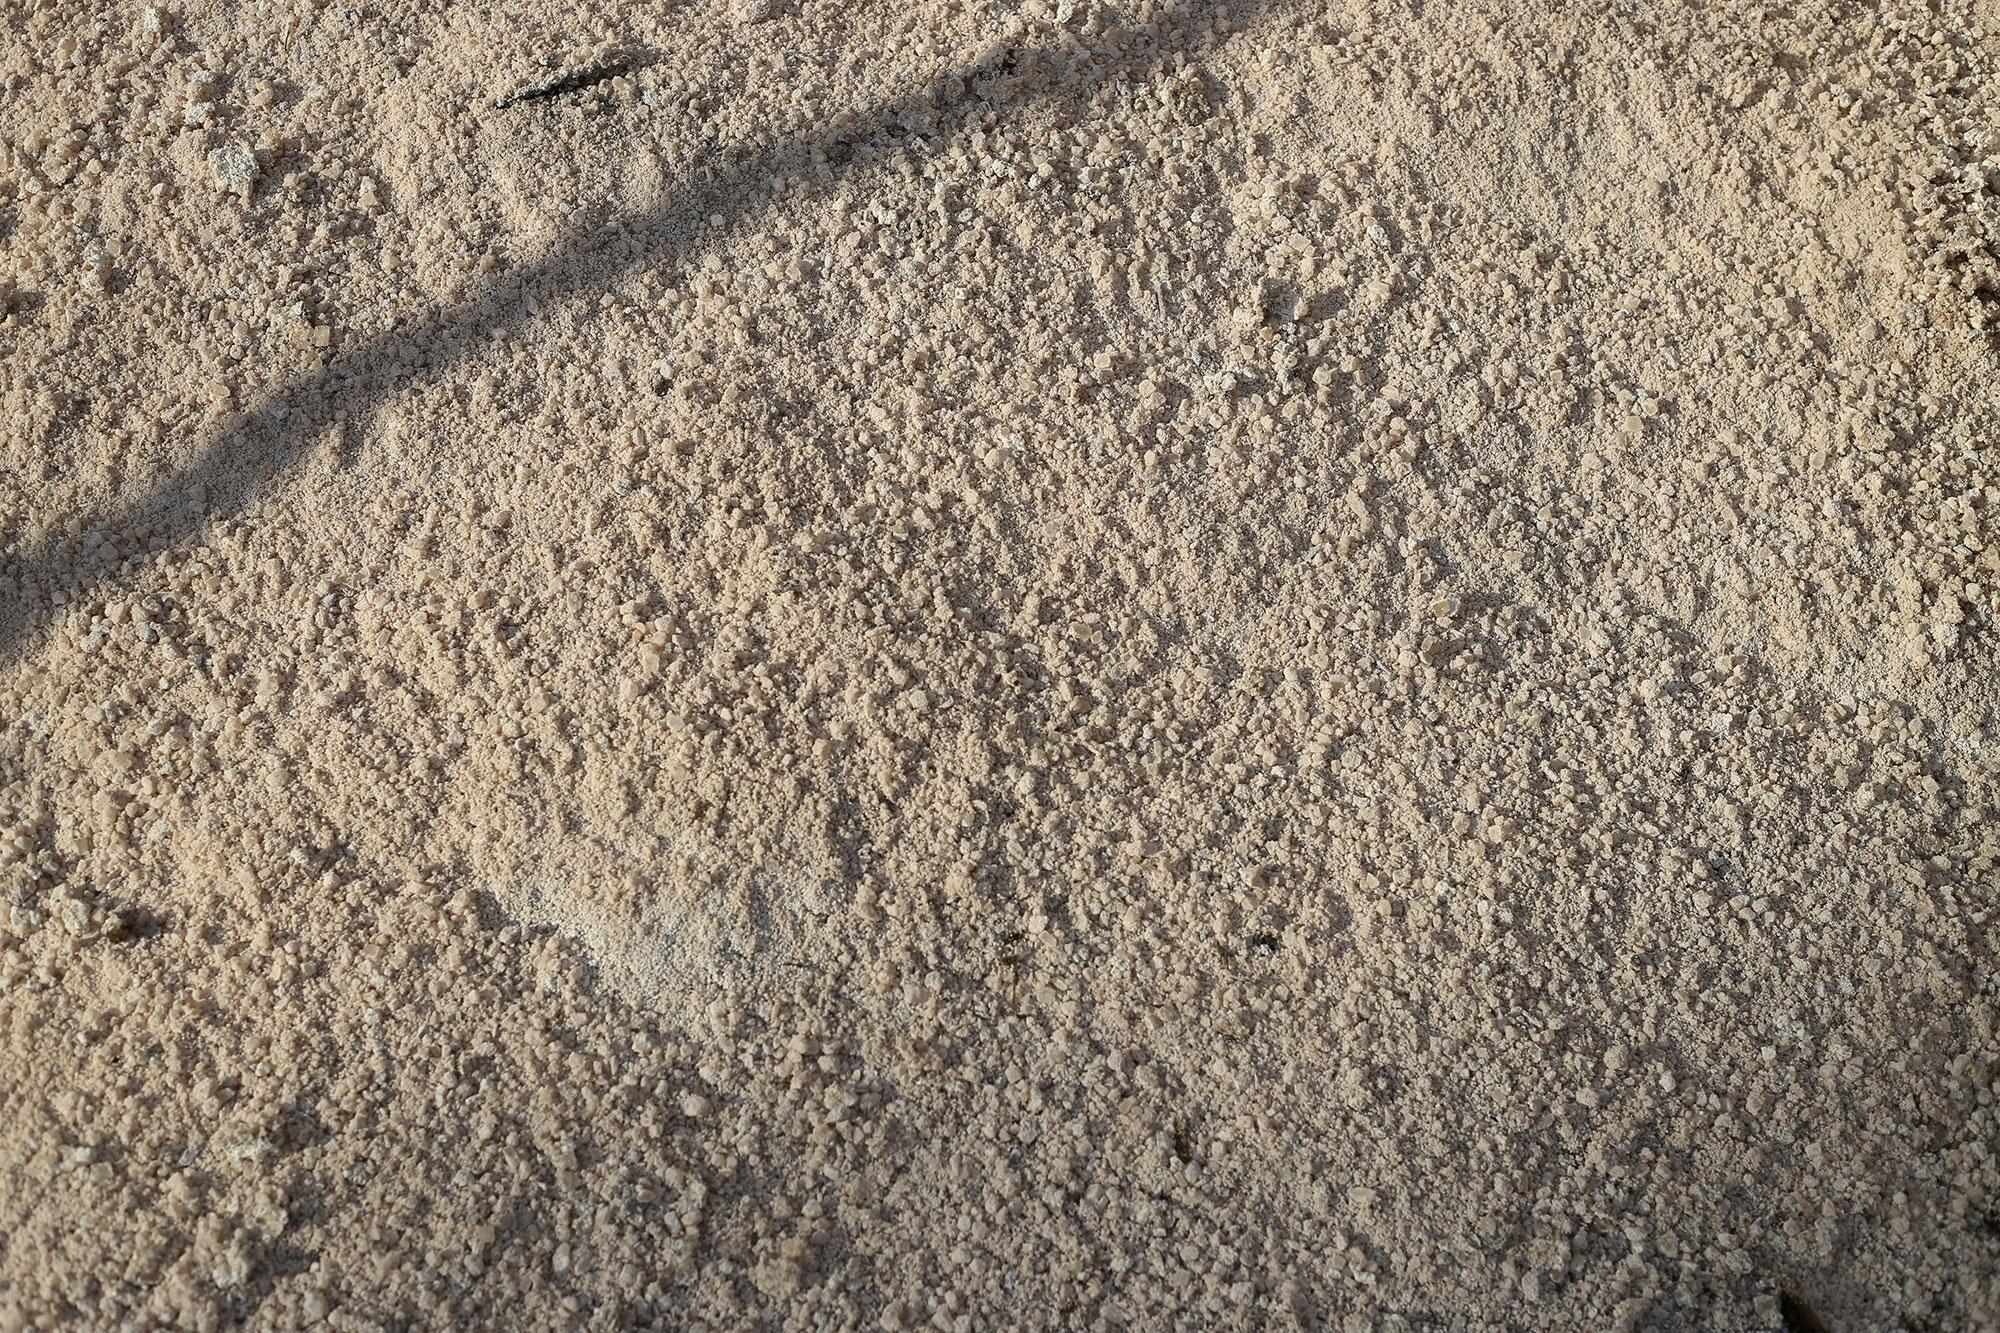 Bulk Salt for Sale at Patuxent Nursery